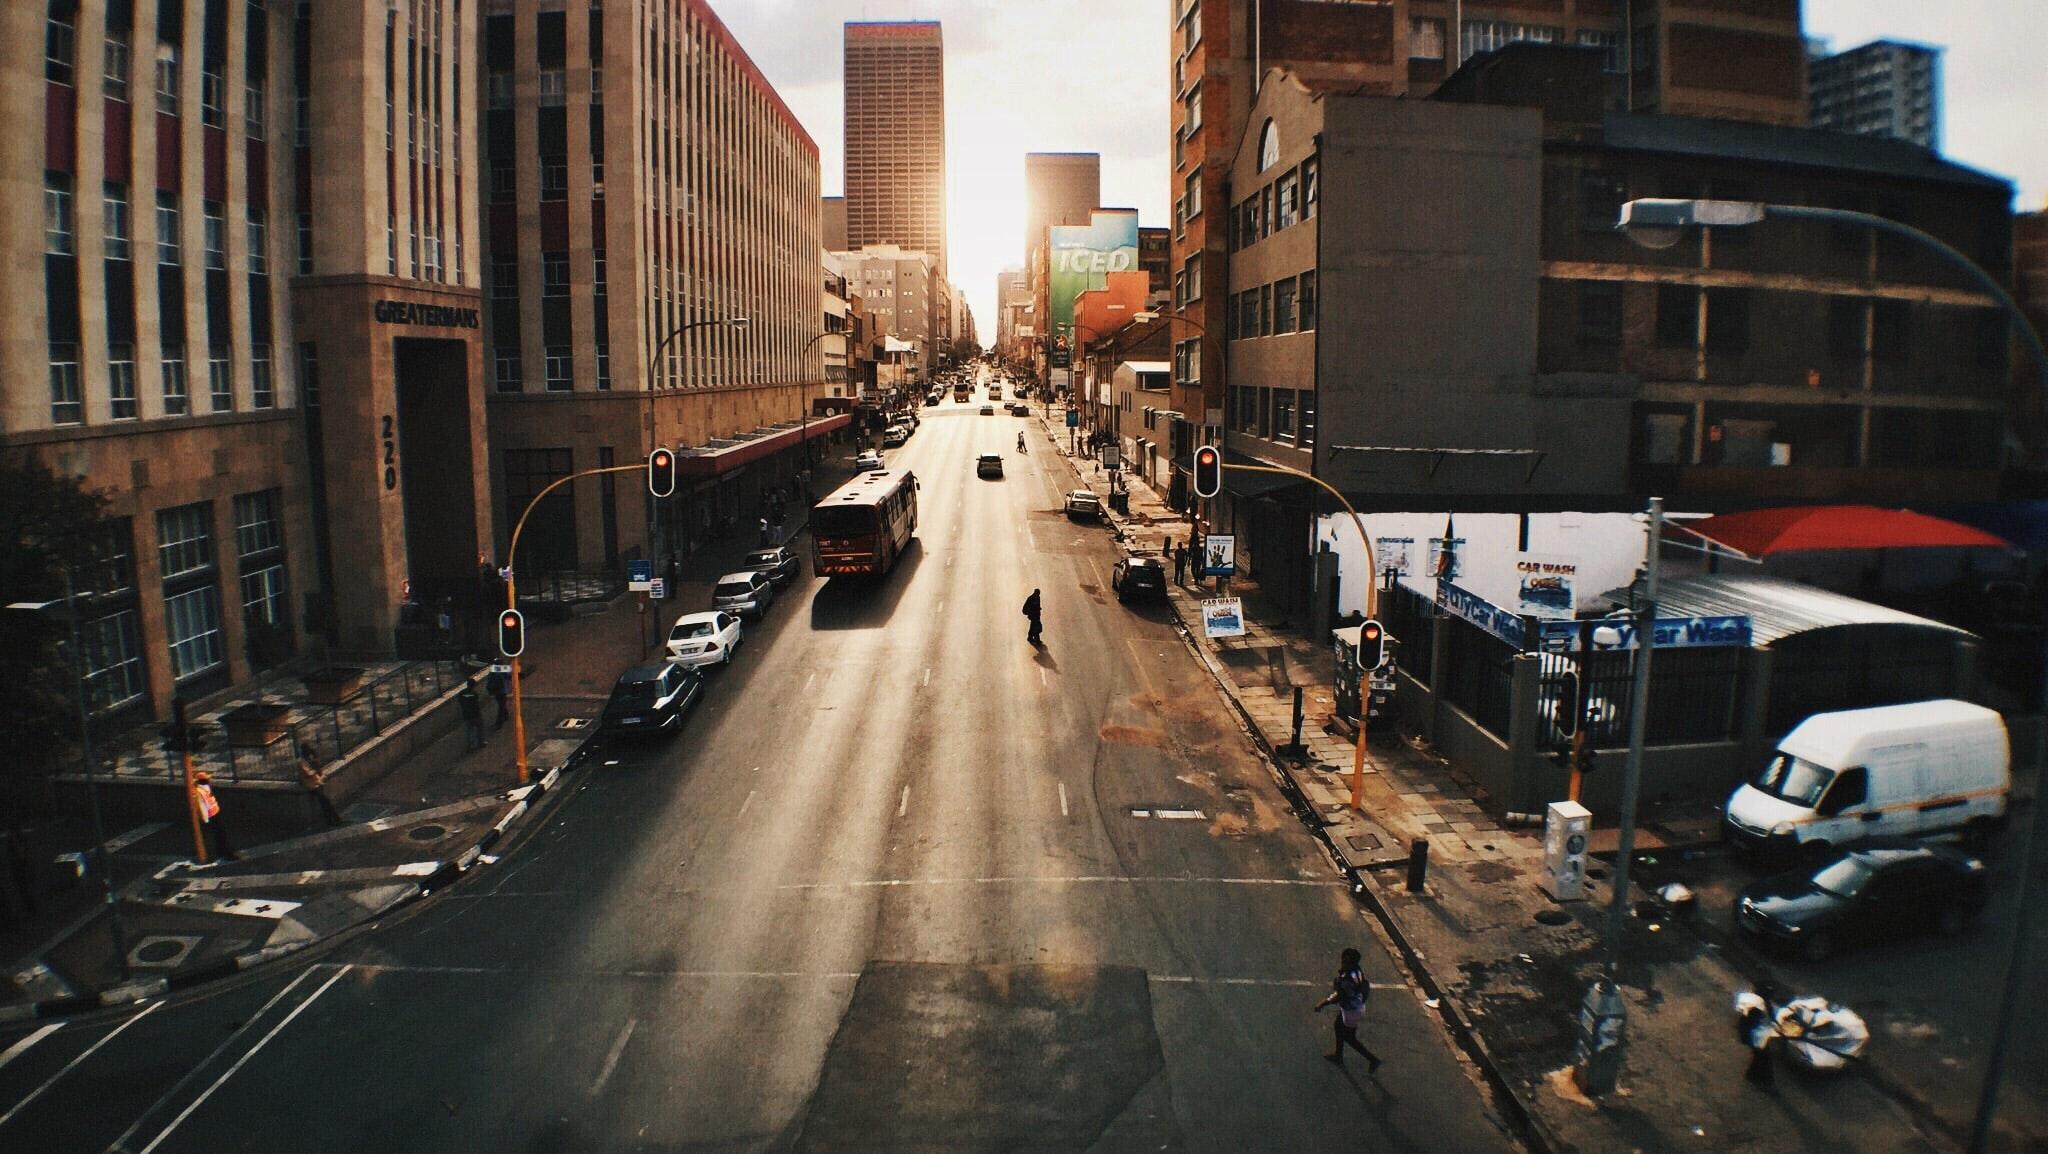 Downtown Johannesburg showing little traffic